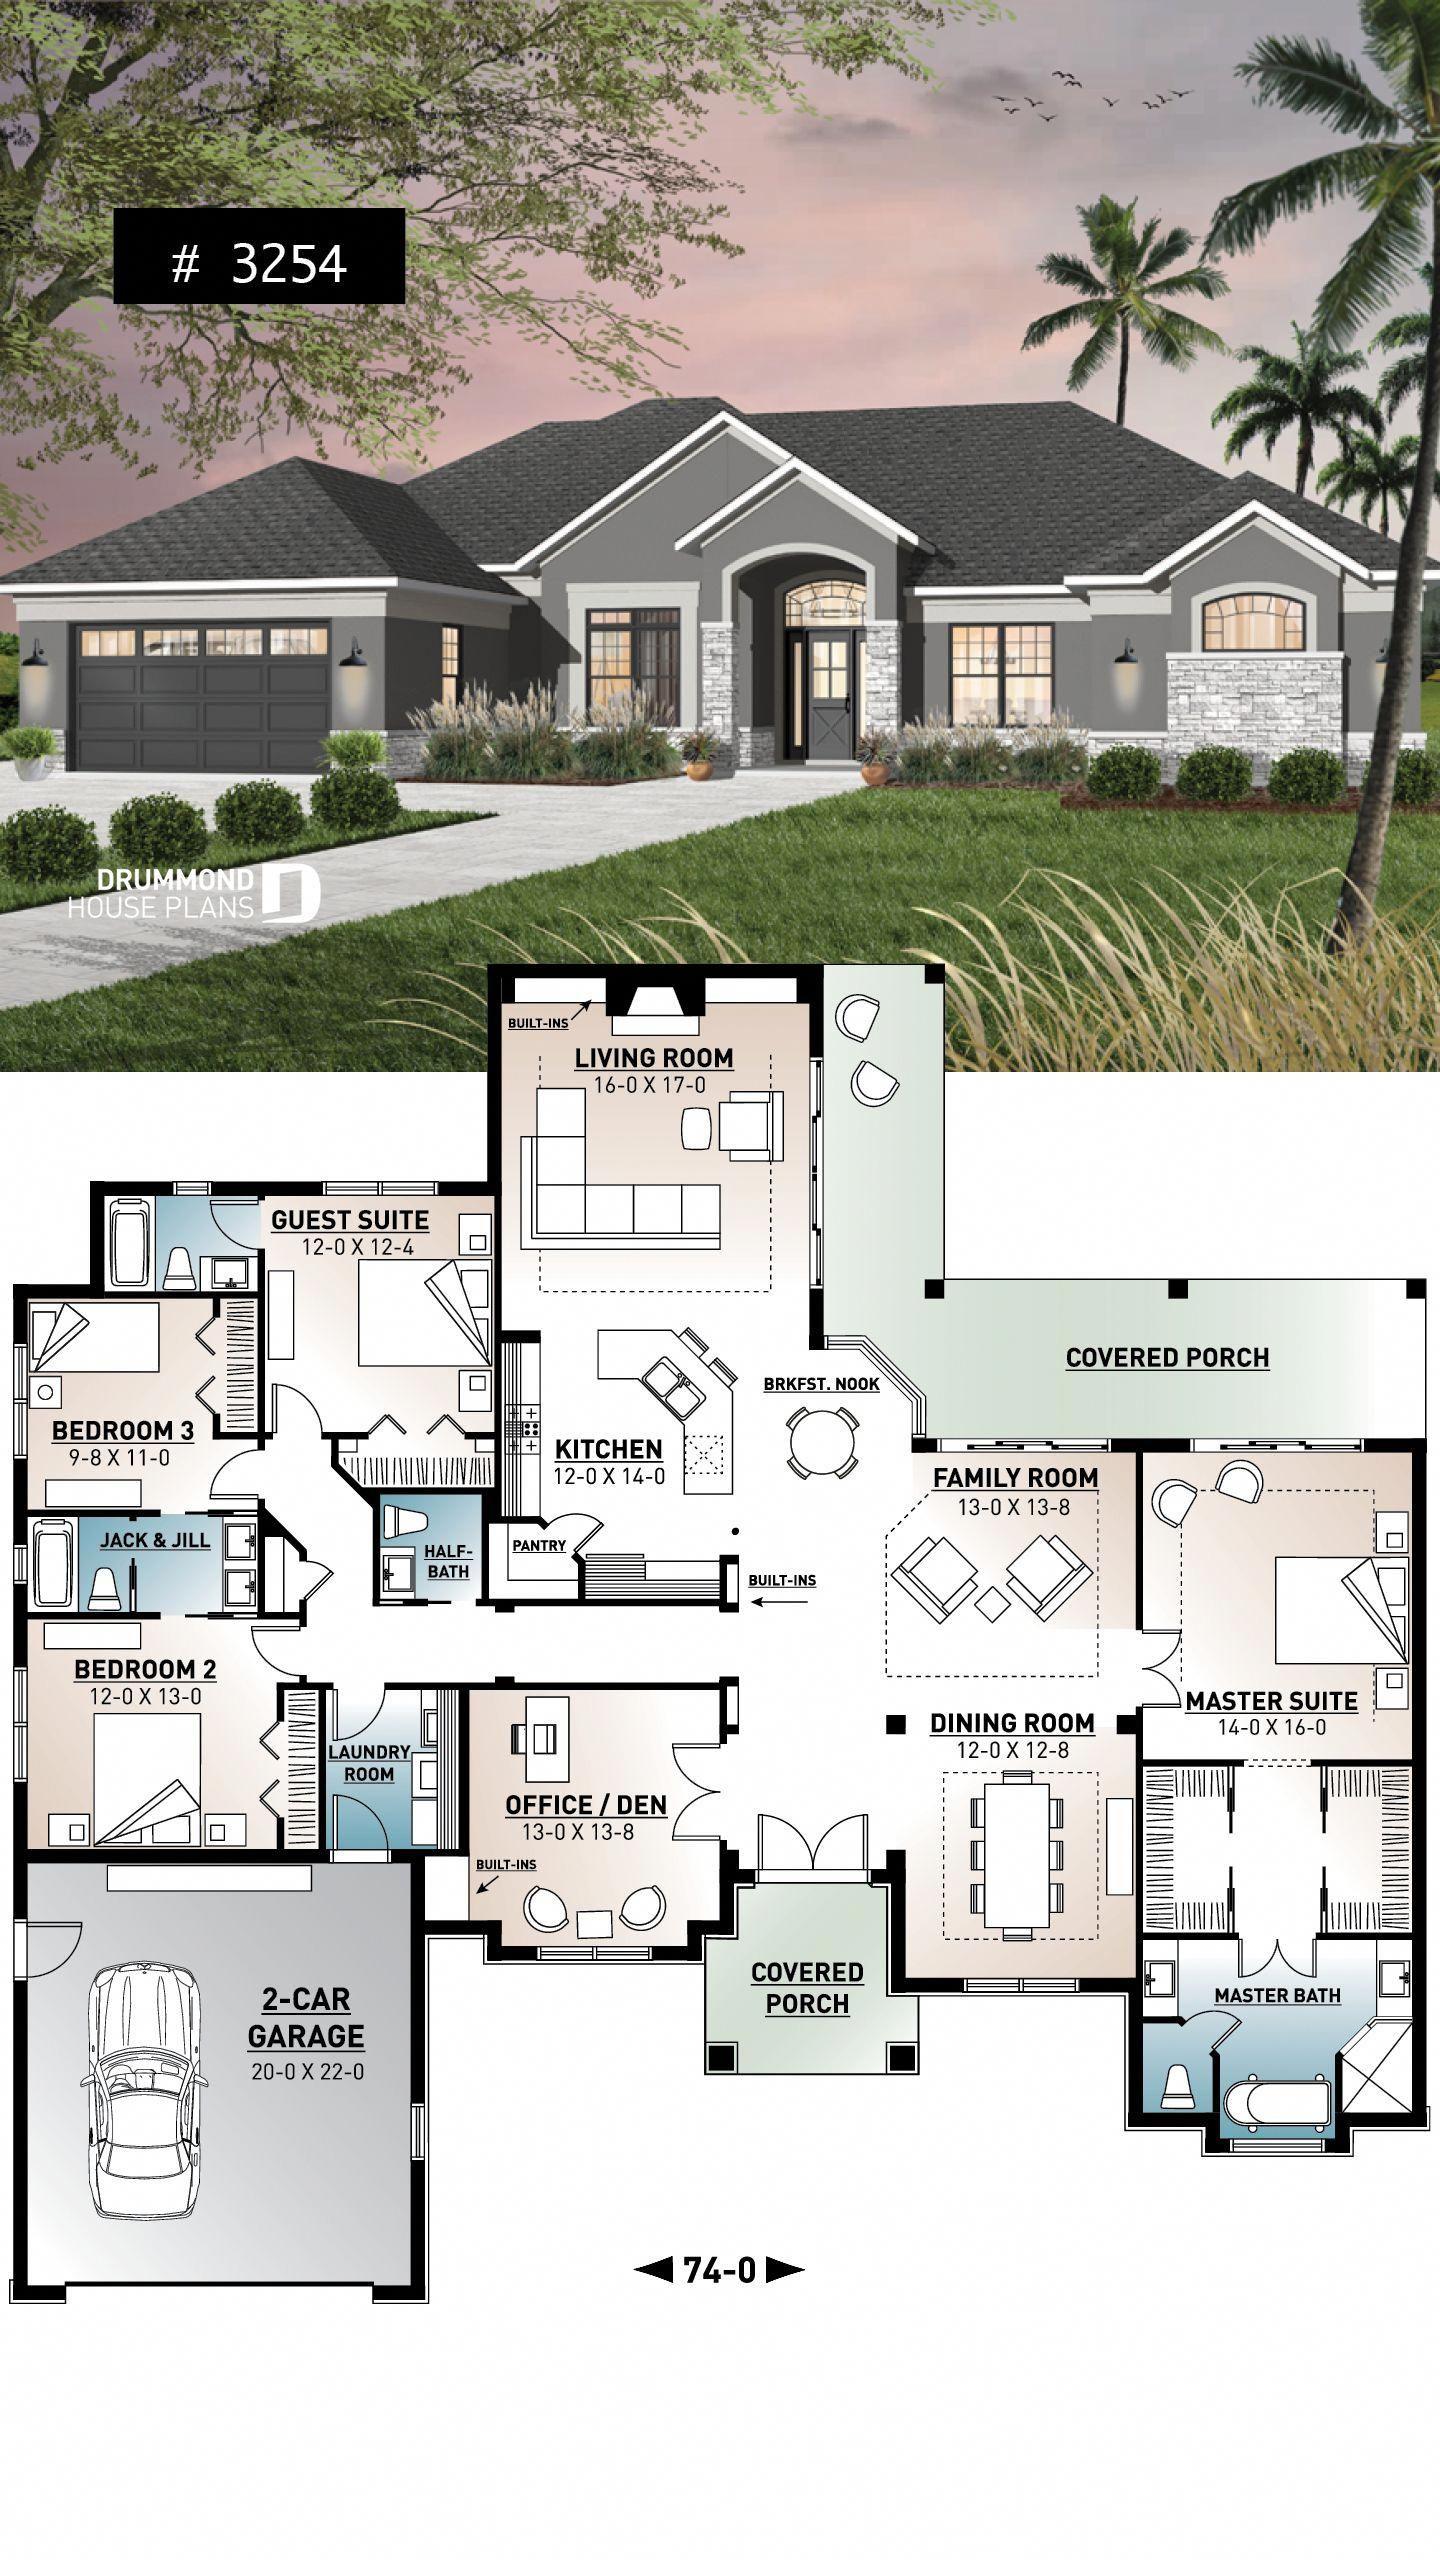 Modern Home Design Accent Gold Modernhomedesign Sims House Plans House Layout Plans House Plans